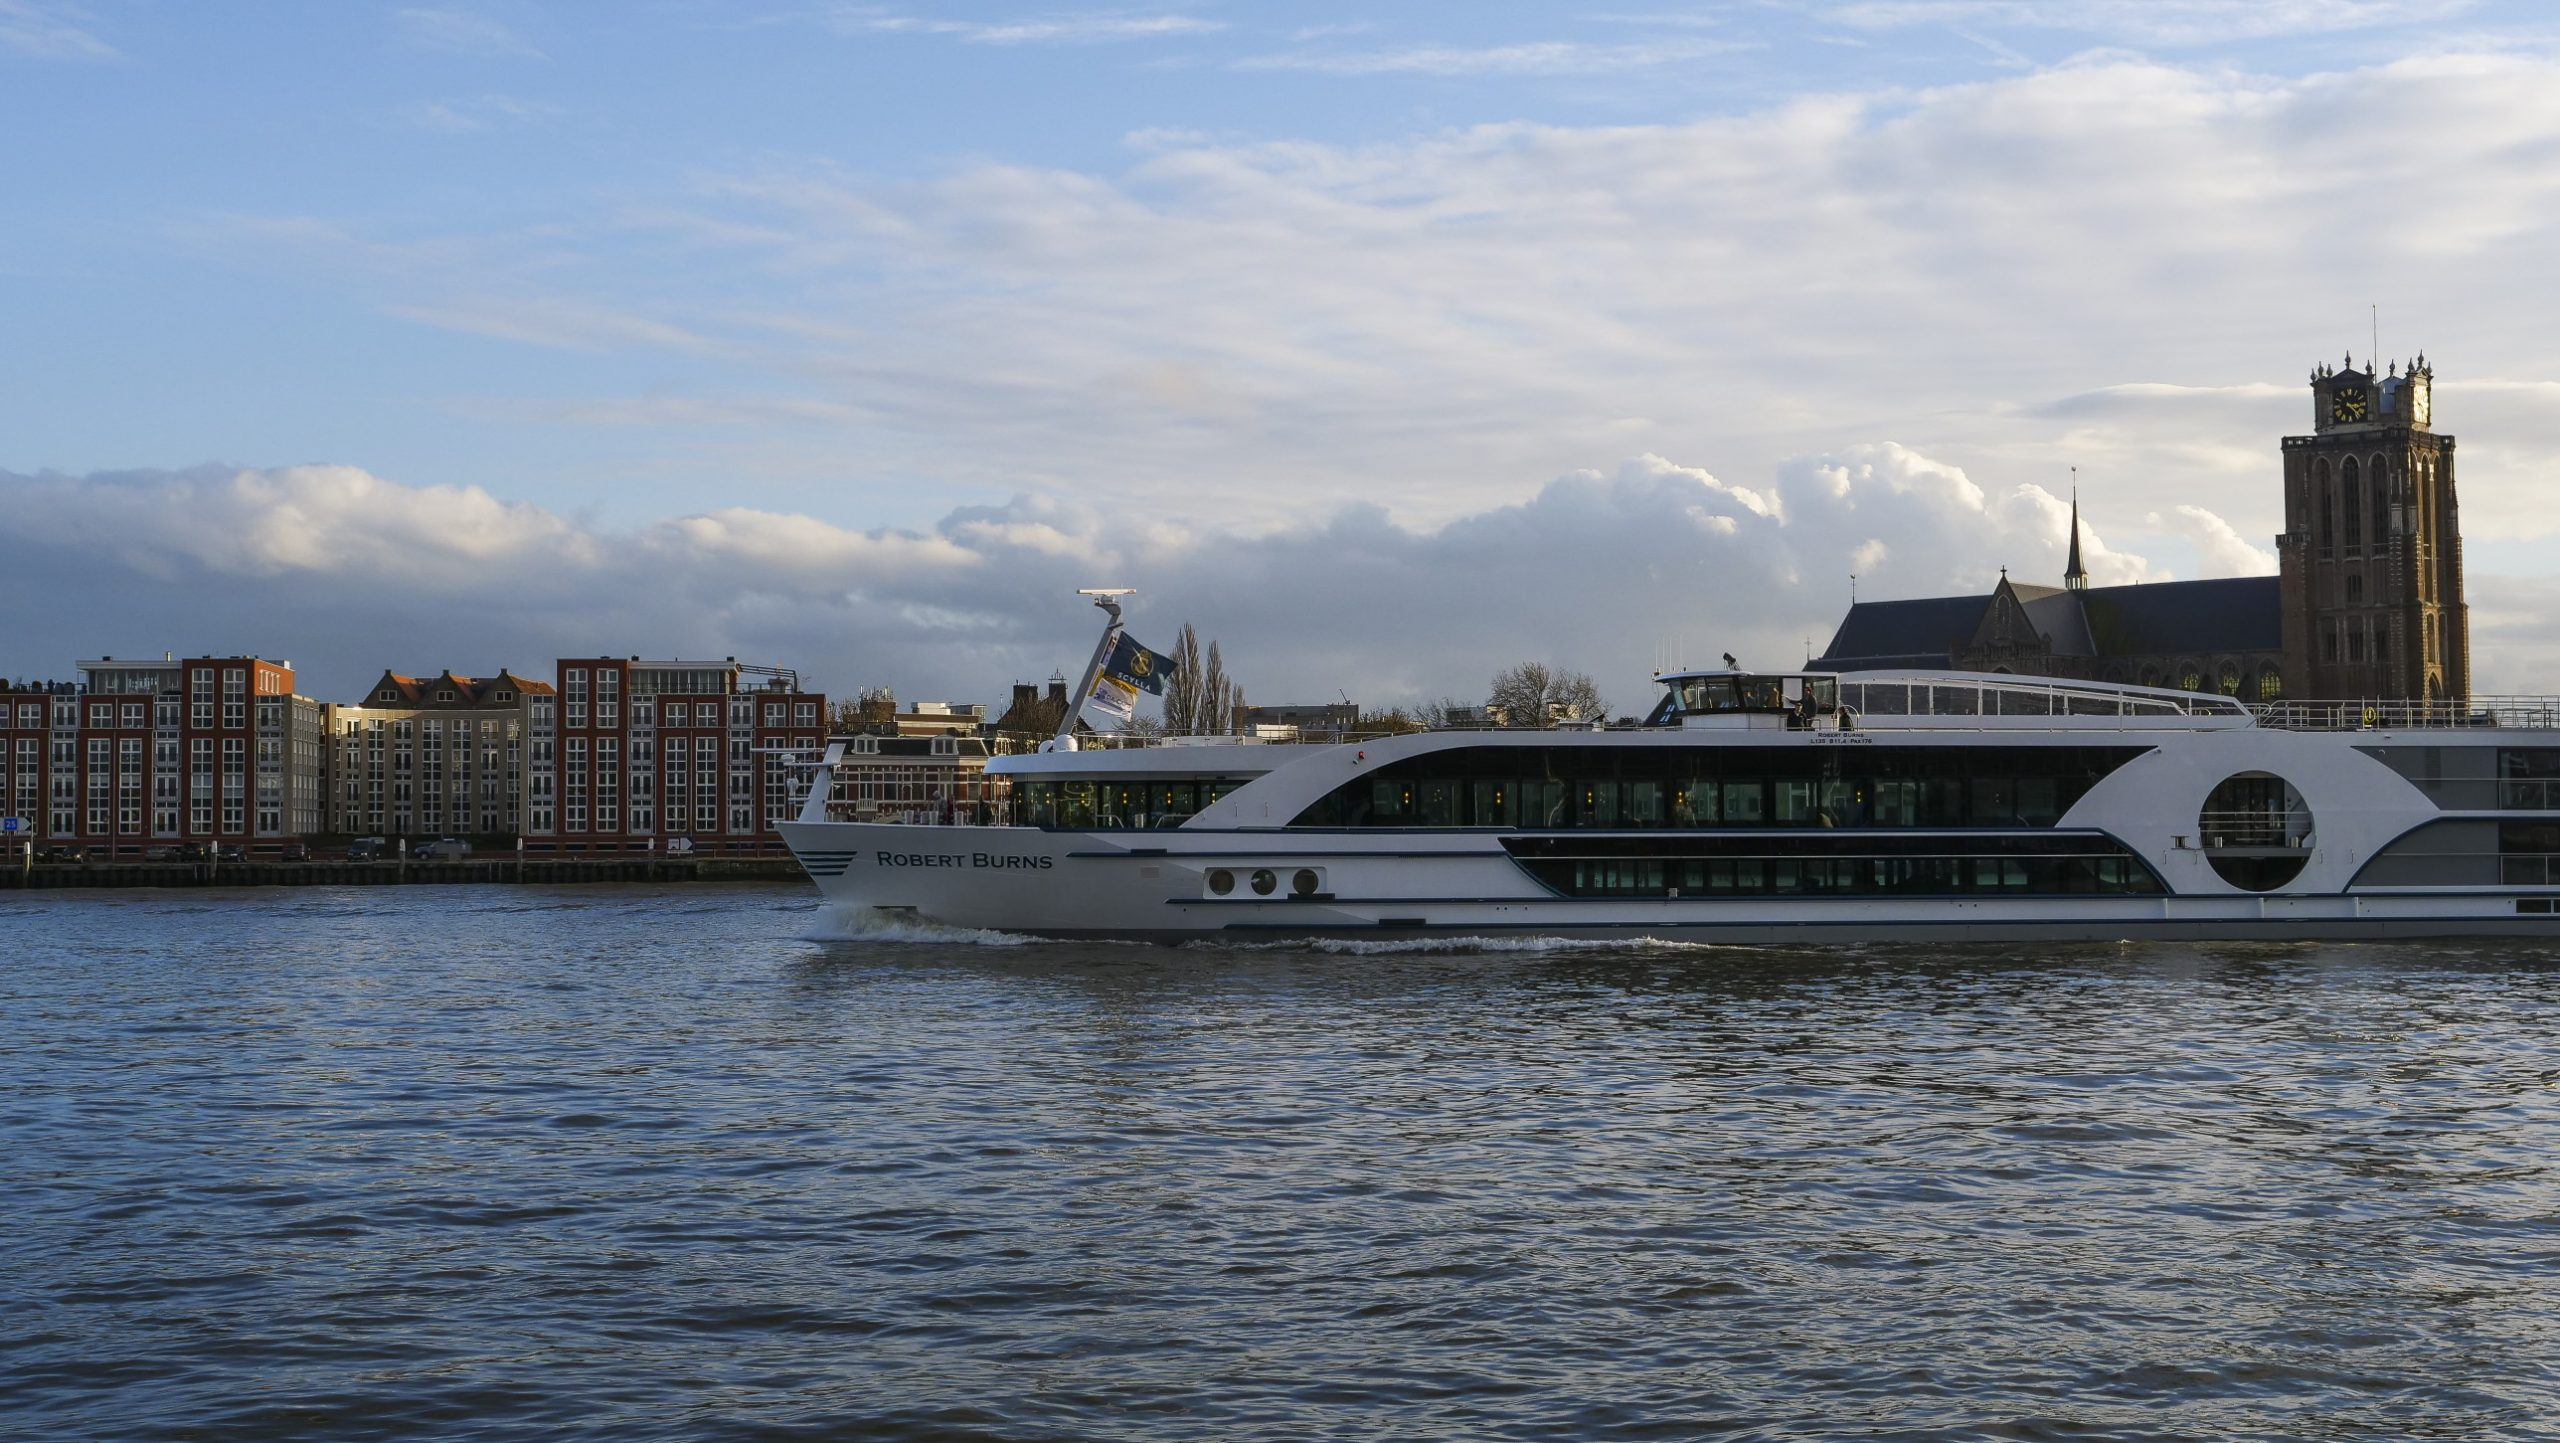 MS Robert Burns - Flusskreuzfahrten-Reisen